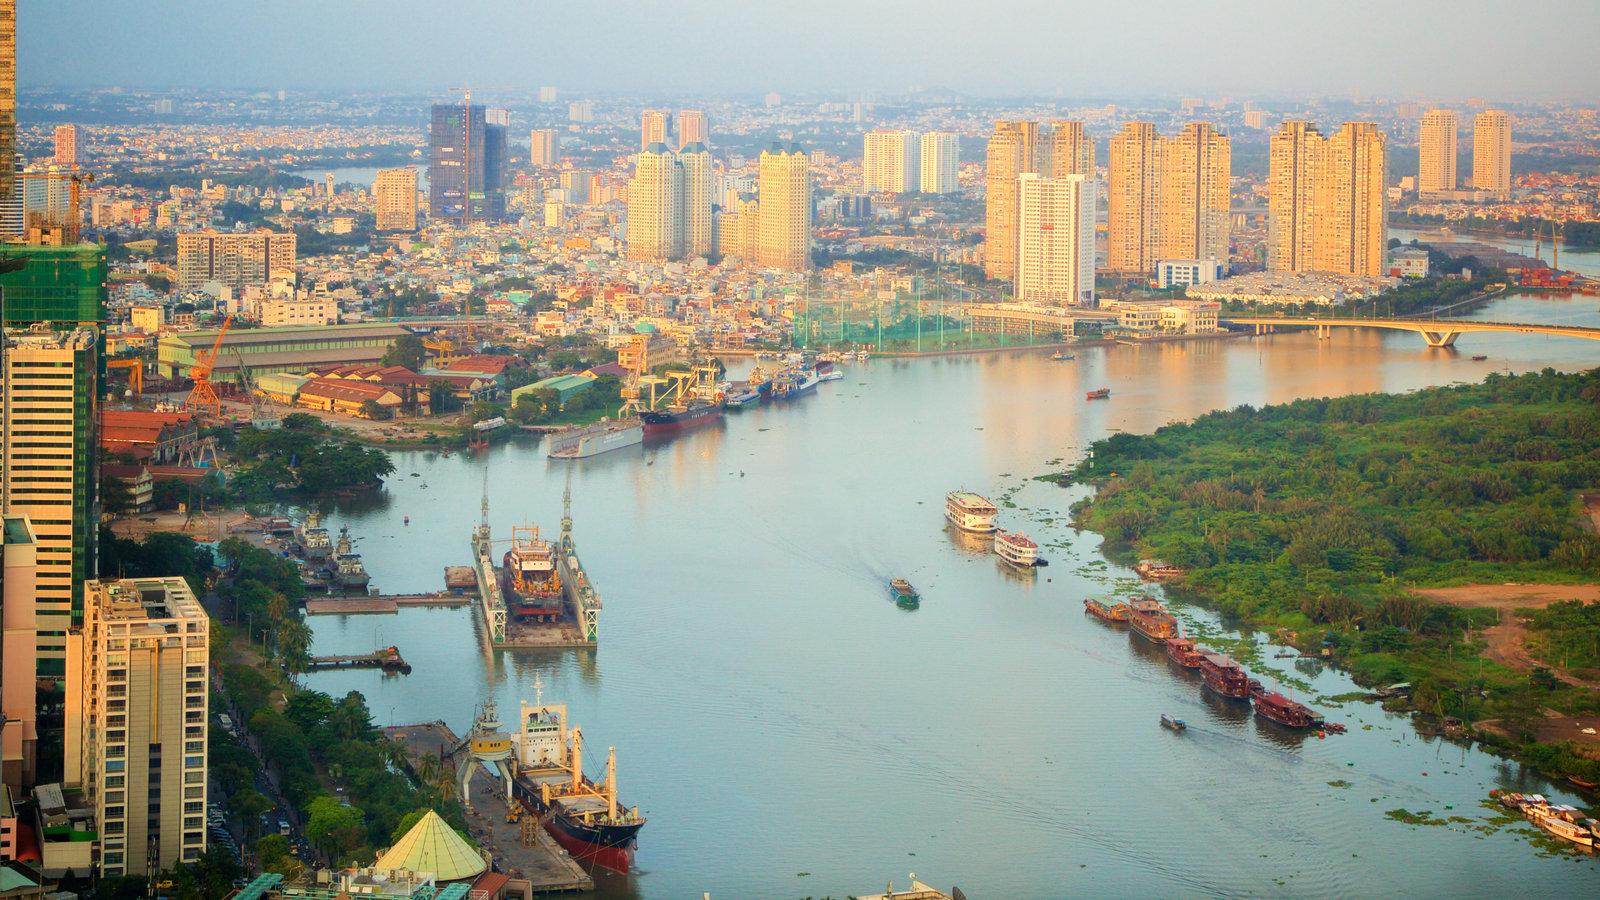 Река Сайгон в городе Хошимин